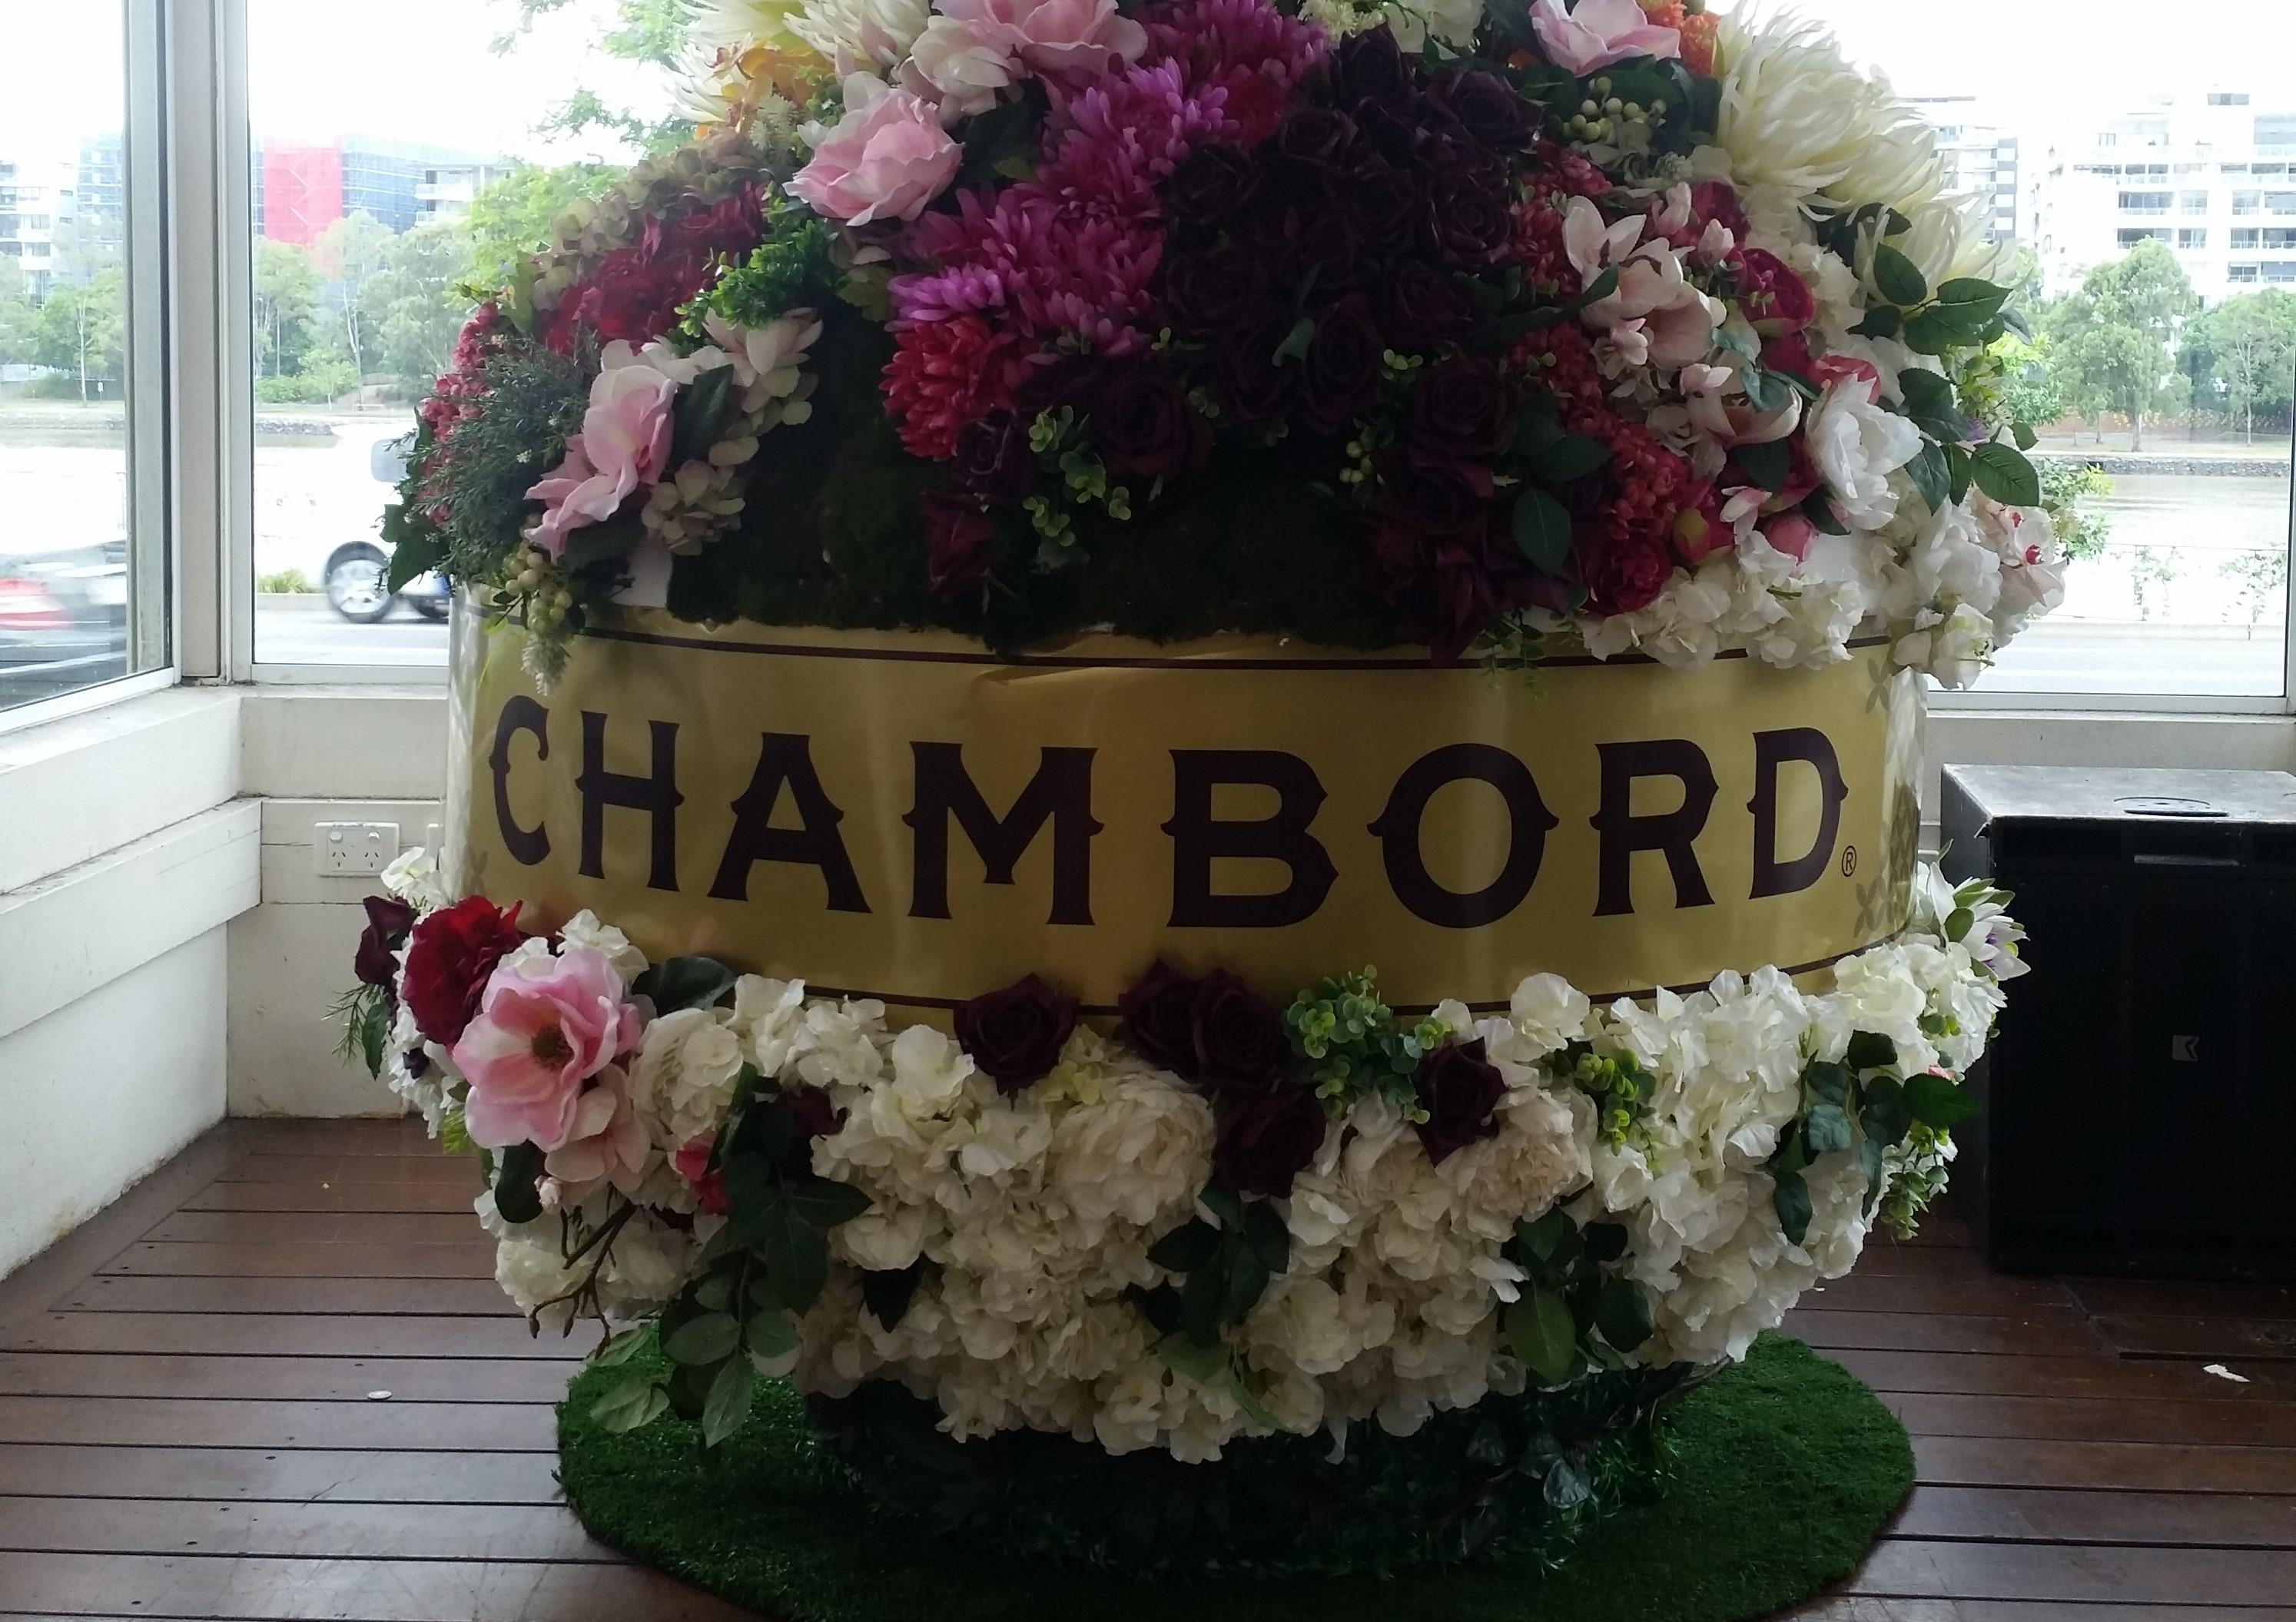 Giant Chambord